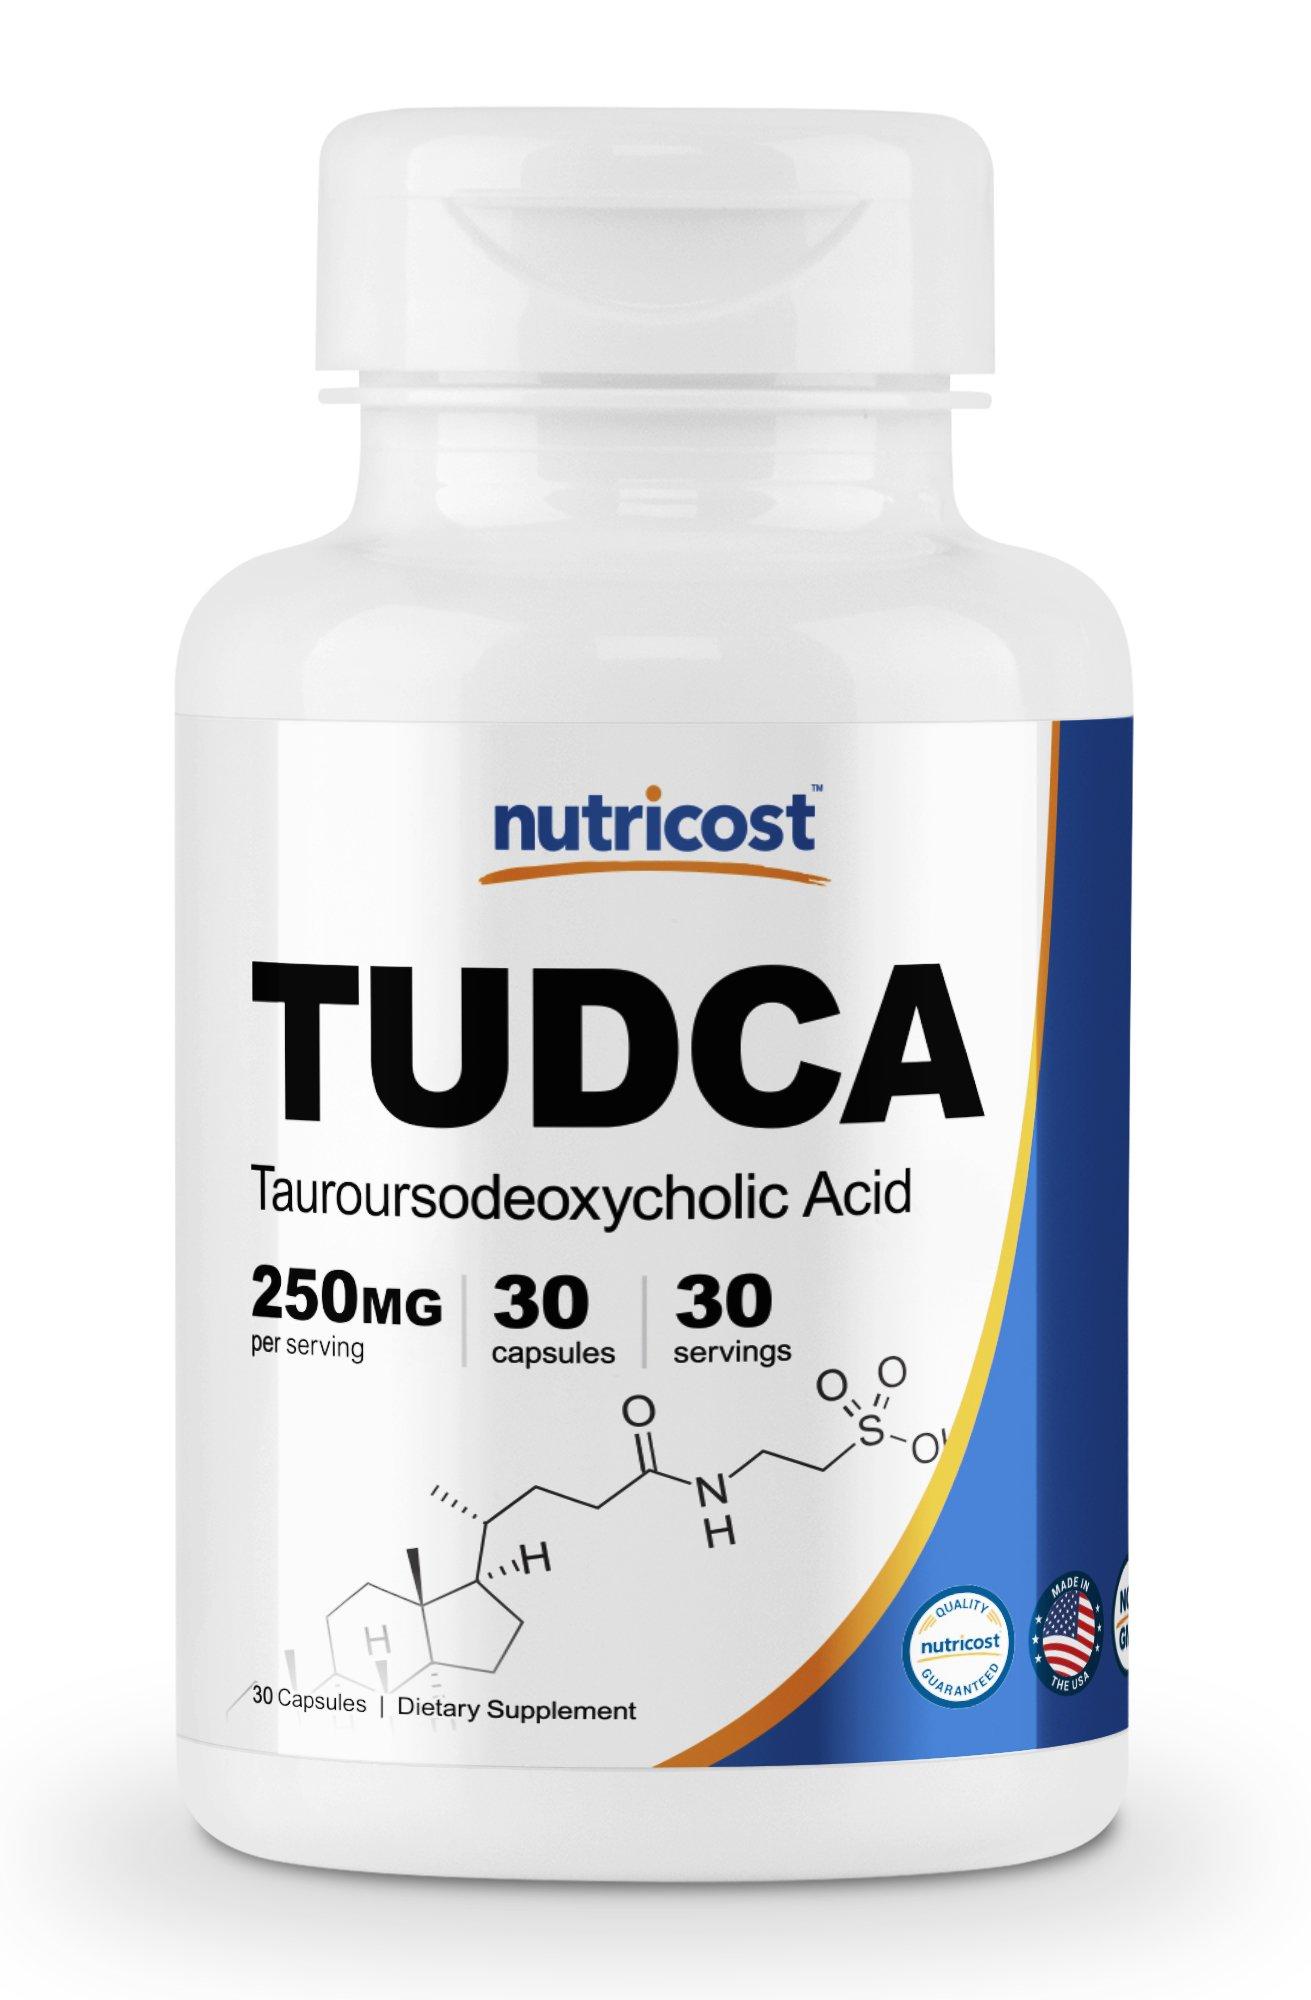 Nutricost Tudca 250mg, 30 Capsules (Tauroursodeoxycholic Acid)